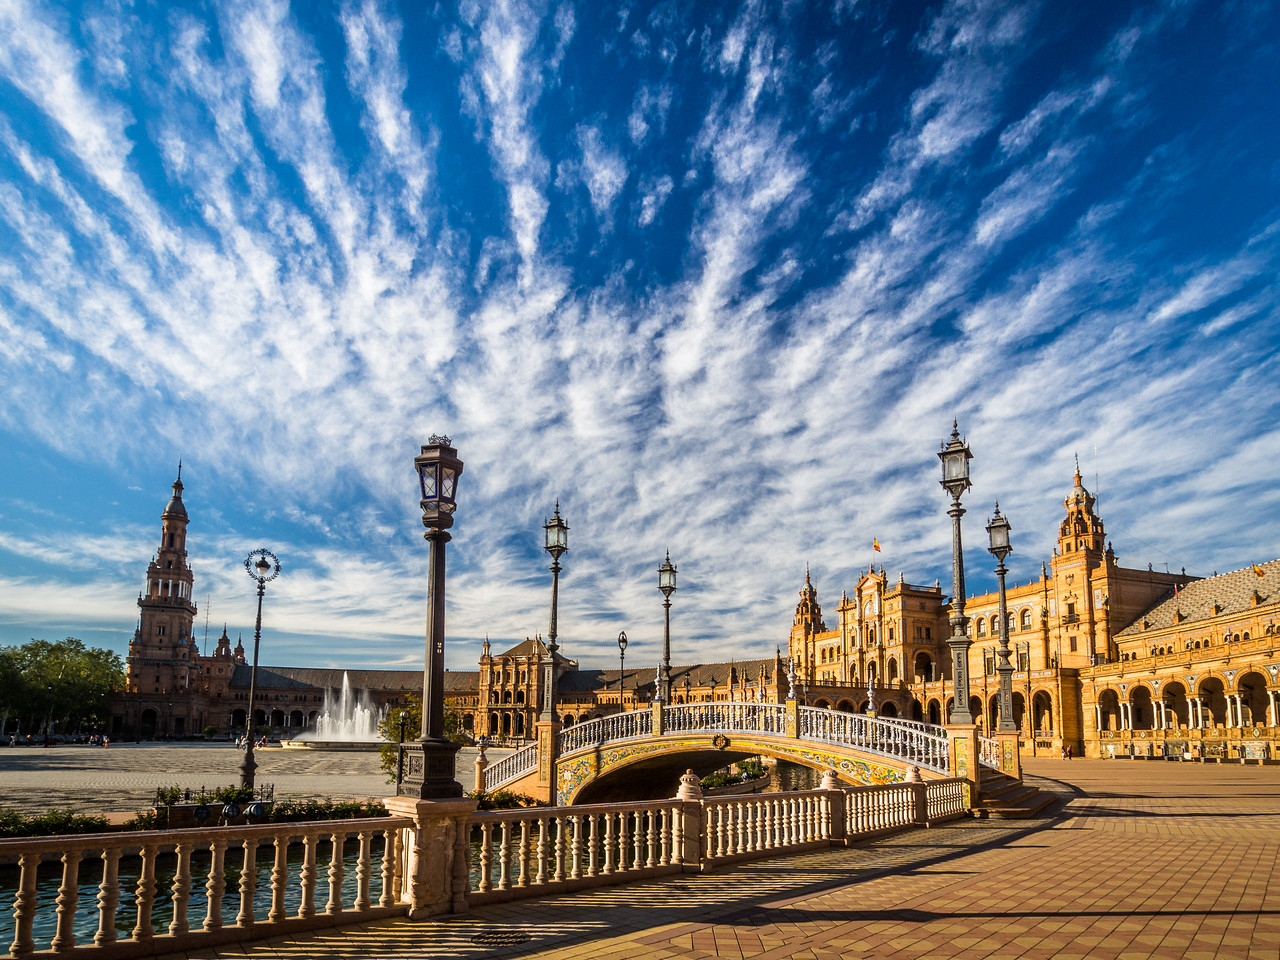 Brilliant Clouds over the Plaza de España, Seville, Spain